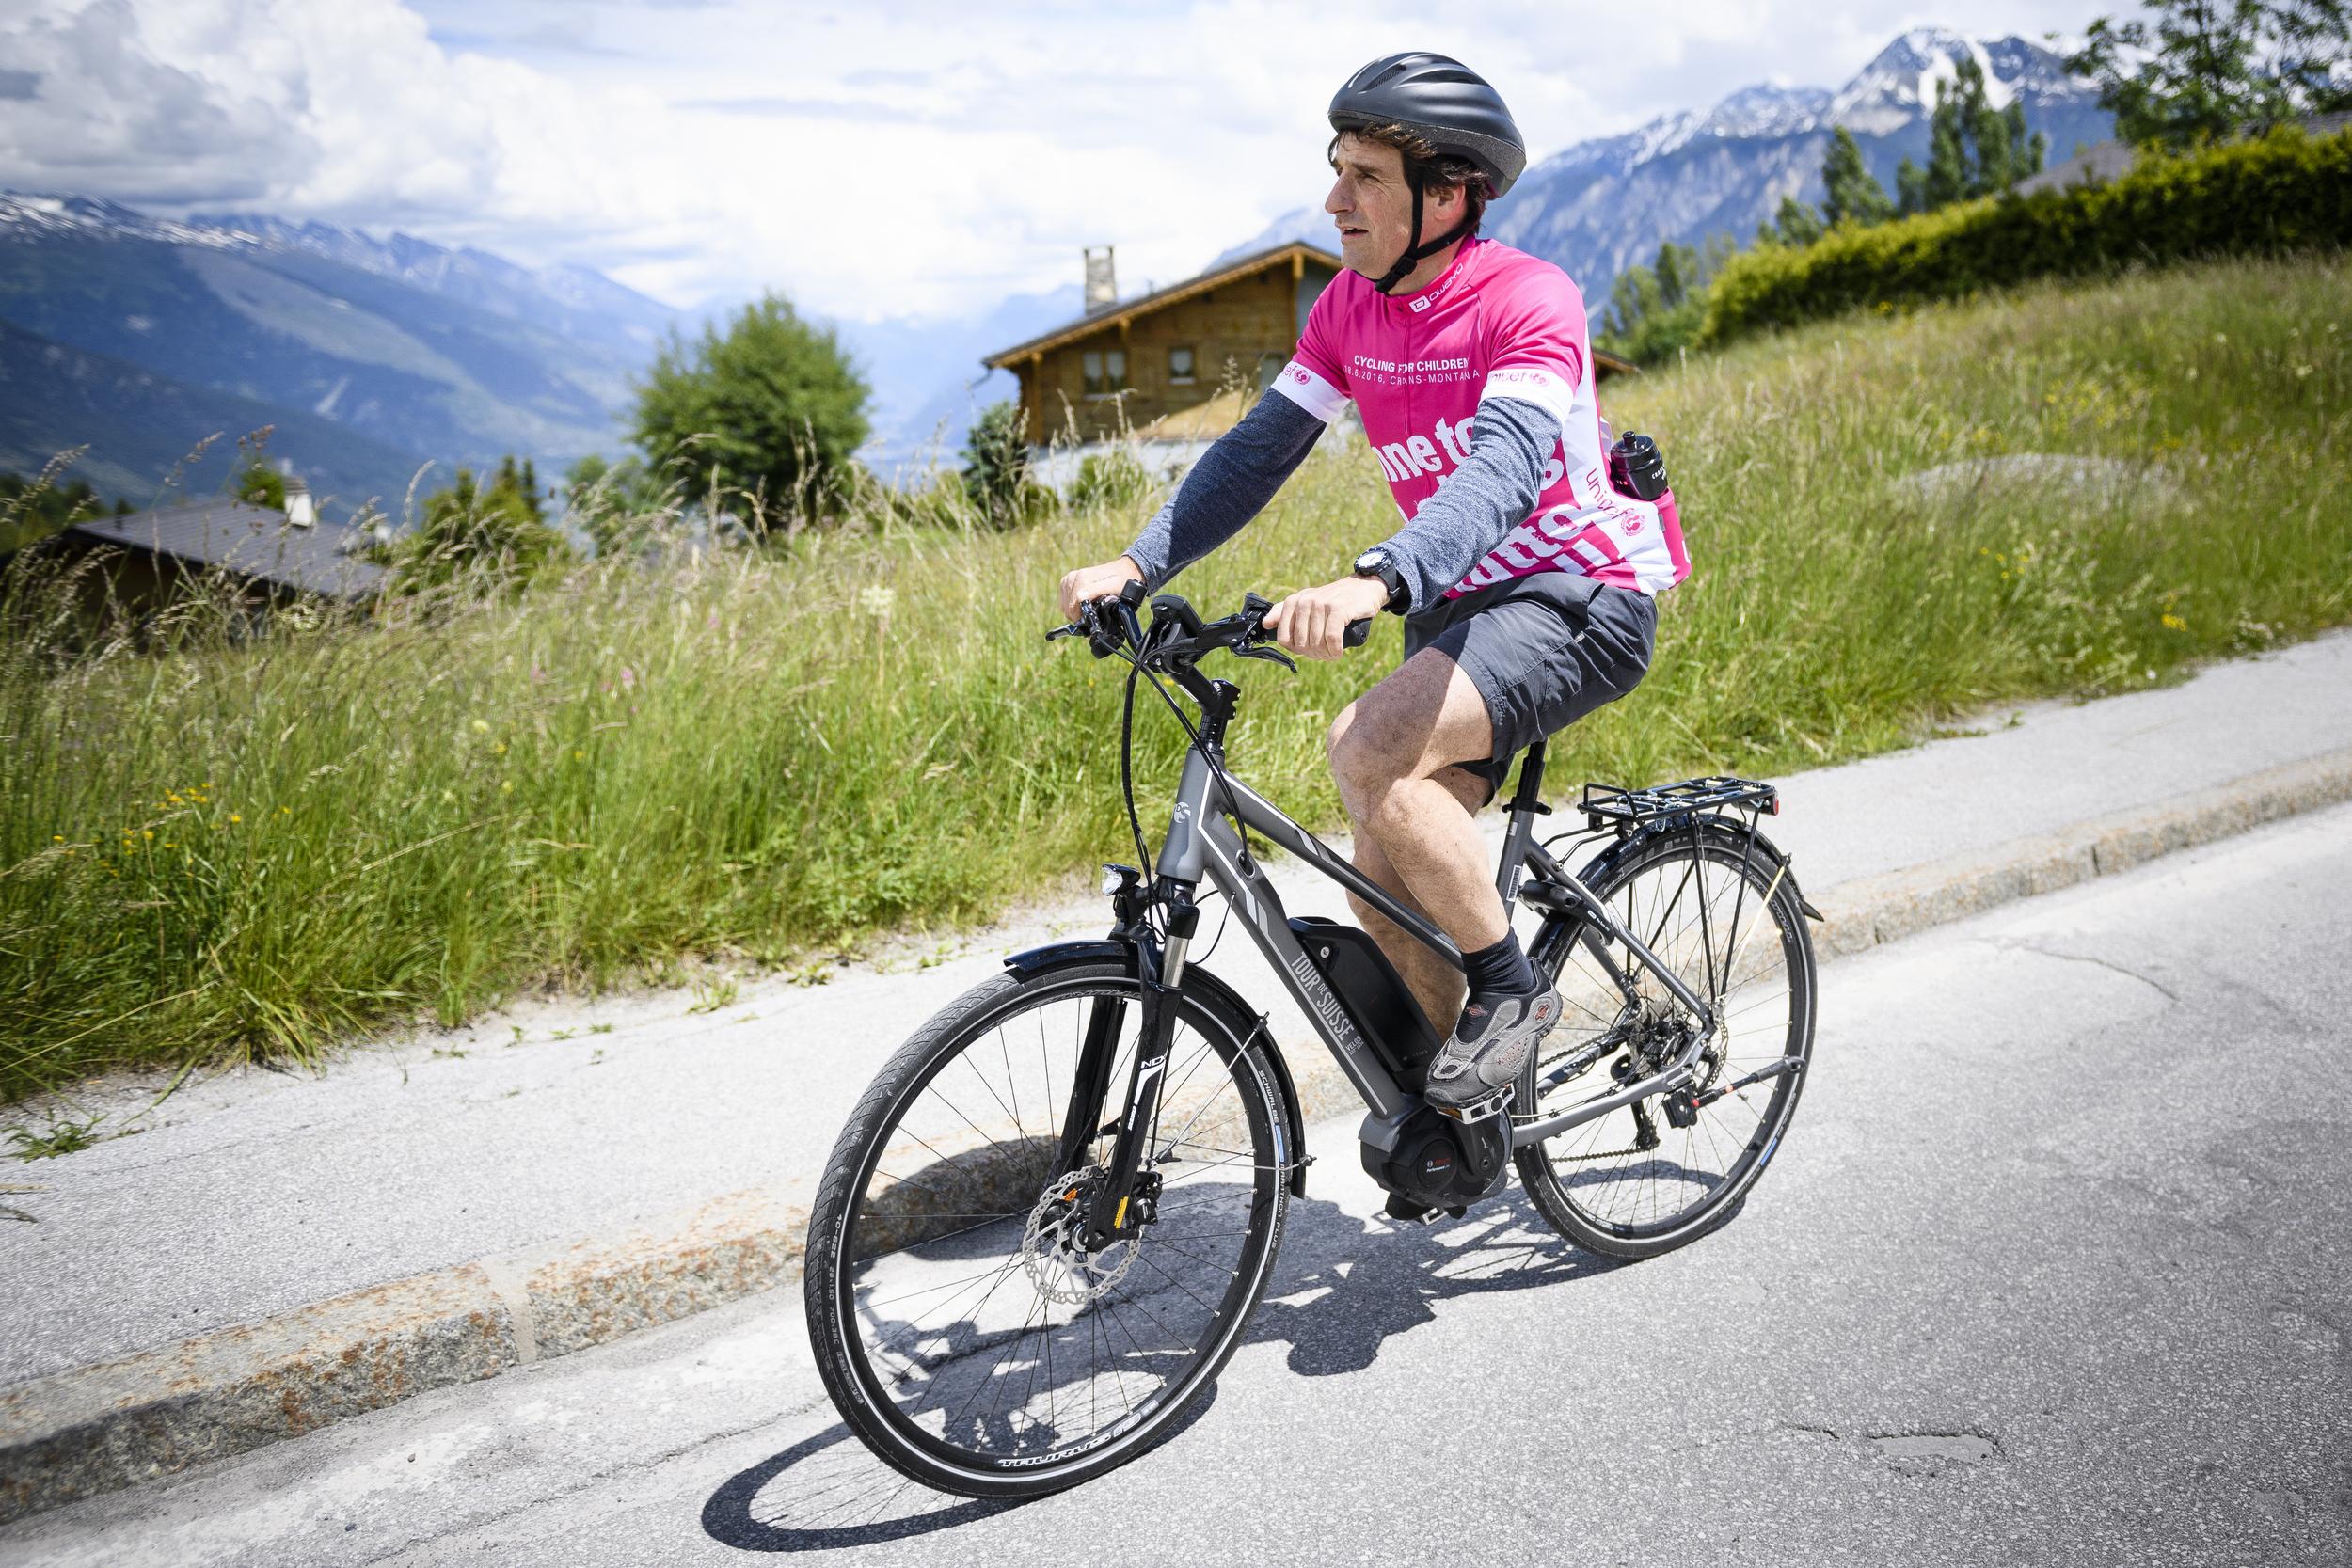 SCHWEIZ CYCLING FOR CHILDREN